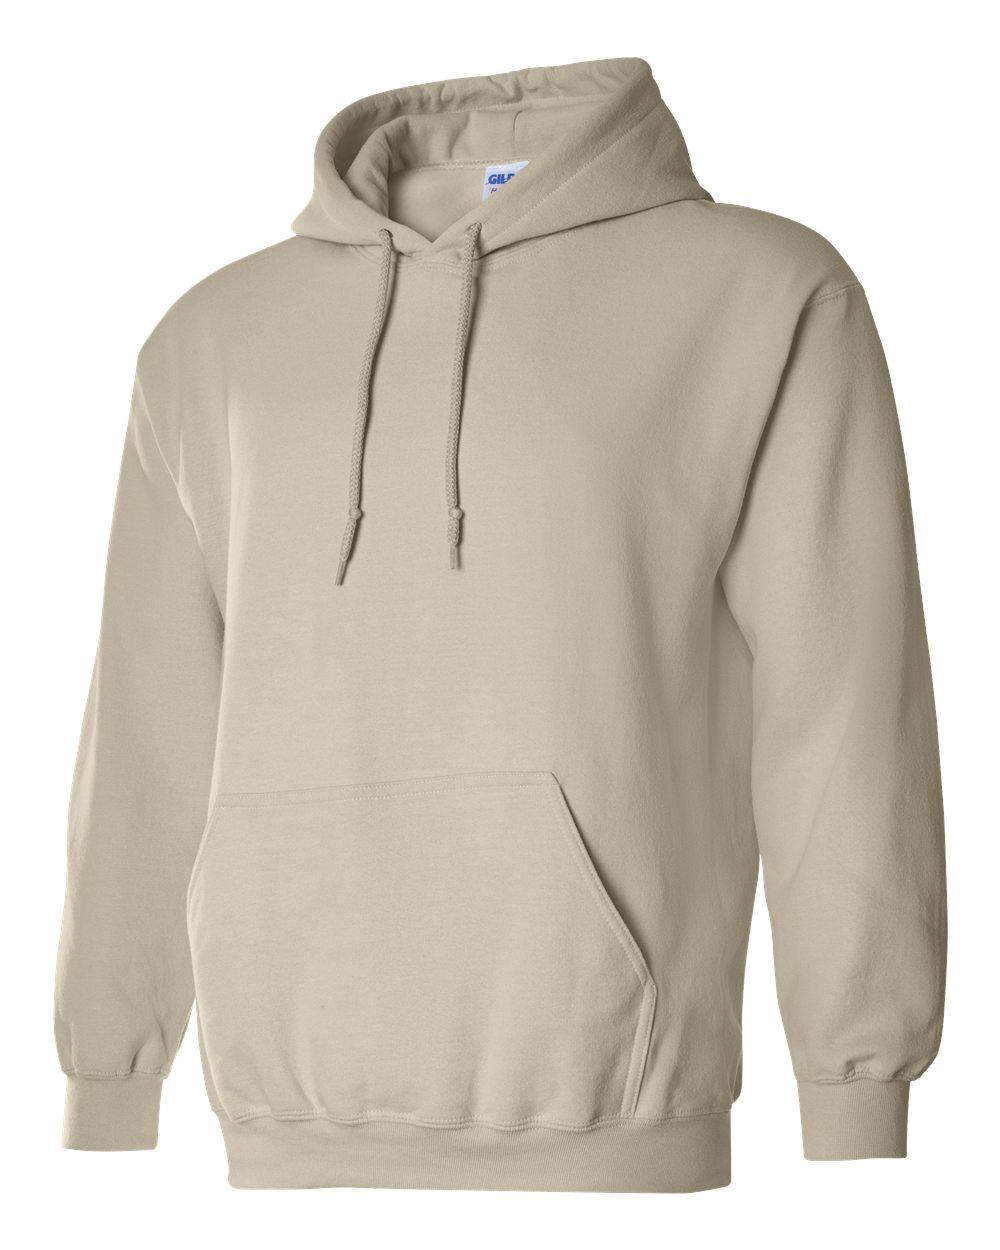 Gildan Heavy Blend Hooded Sweatshirt GI18500 Sand